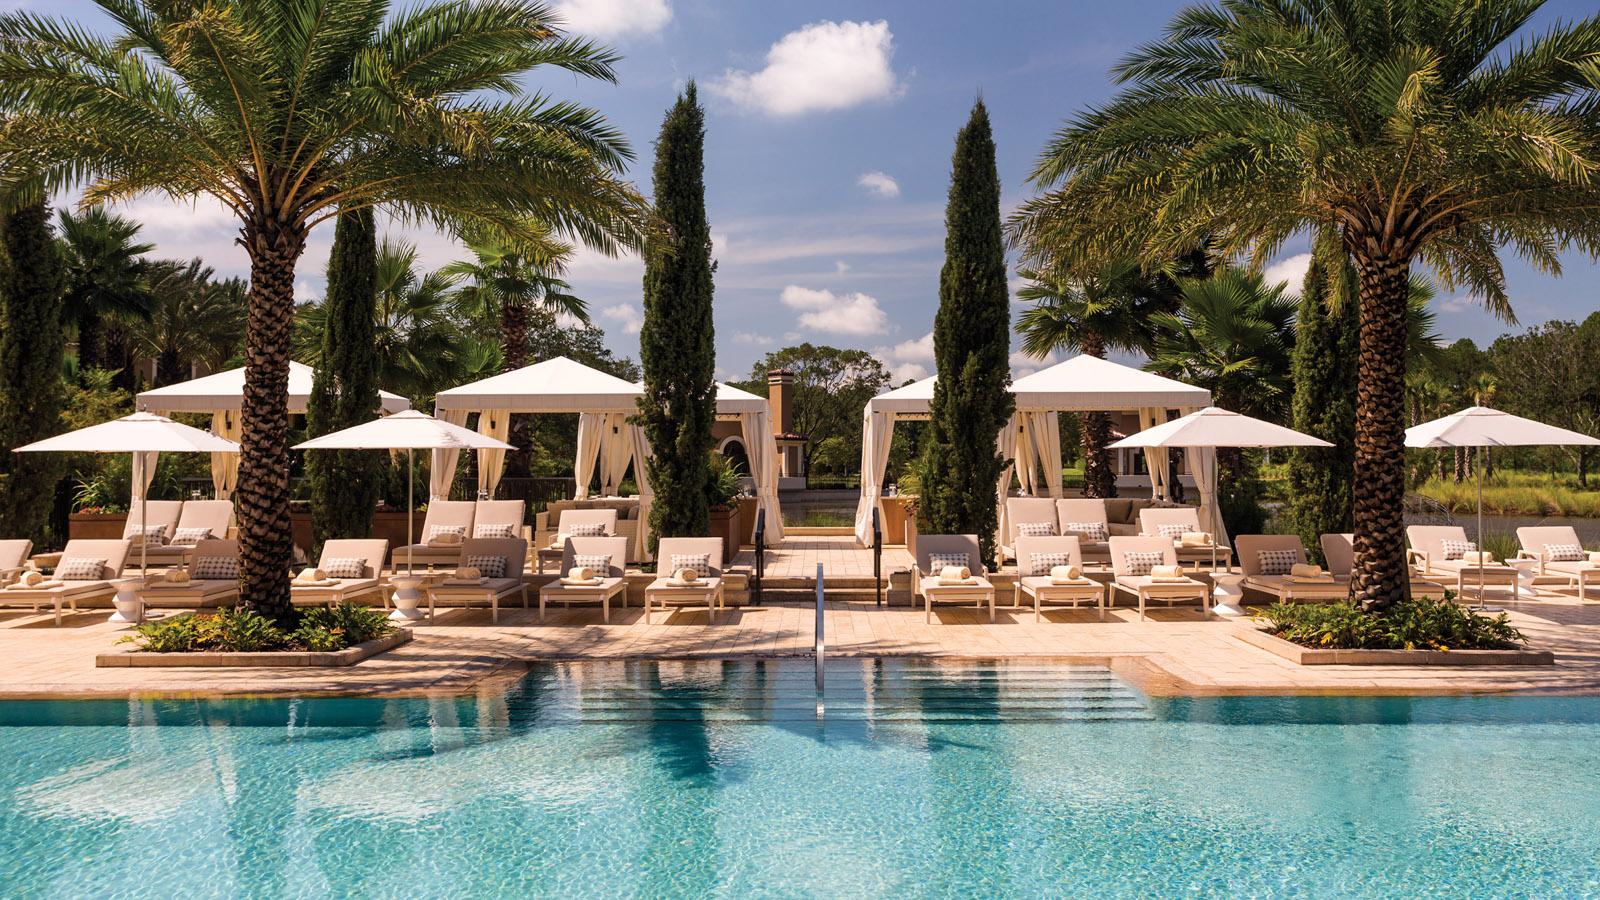 spa in orlando four seasons orlando at walt disney world resort